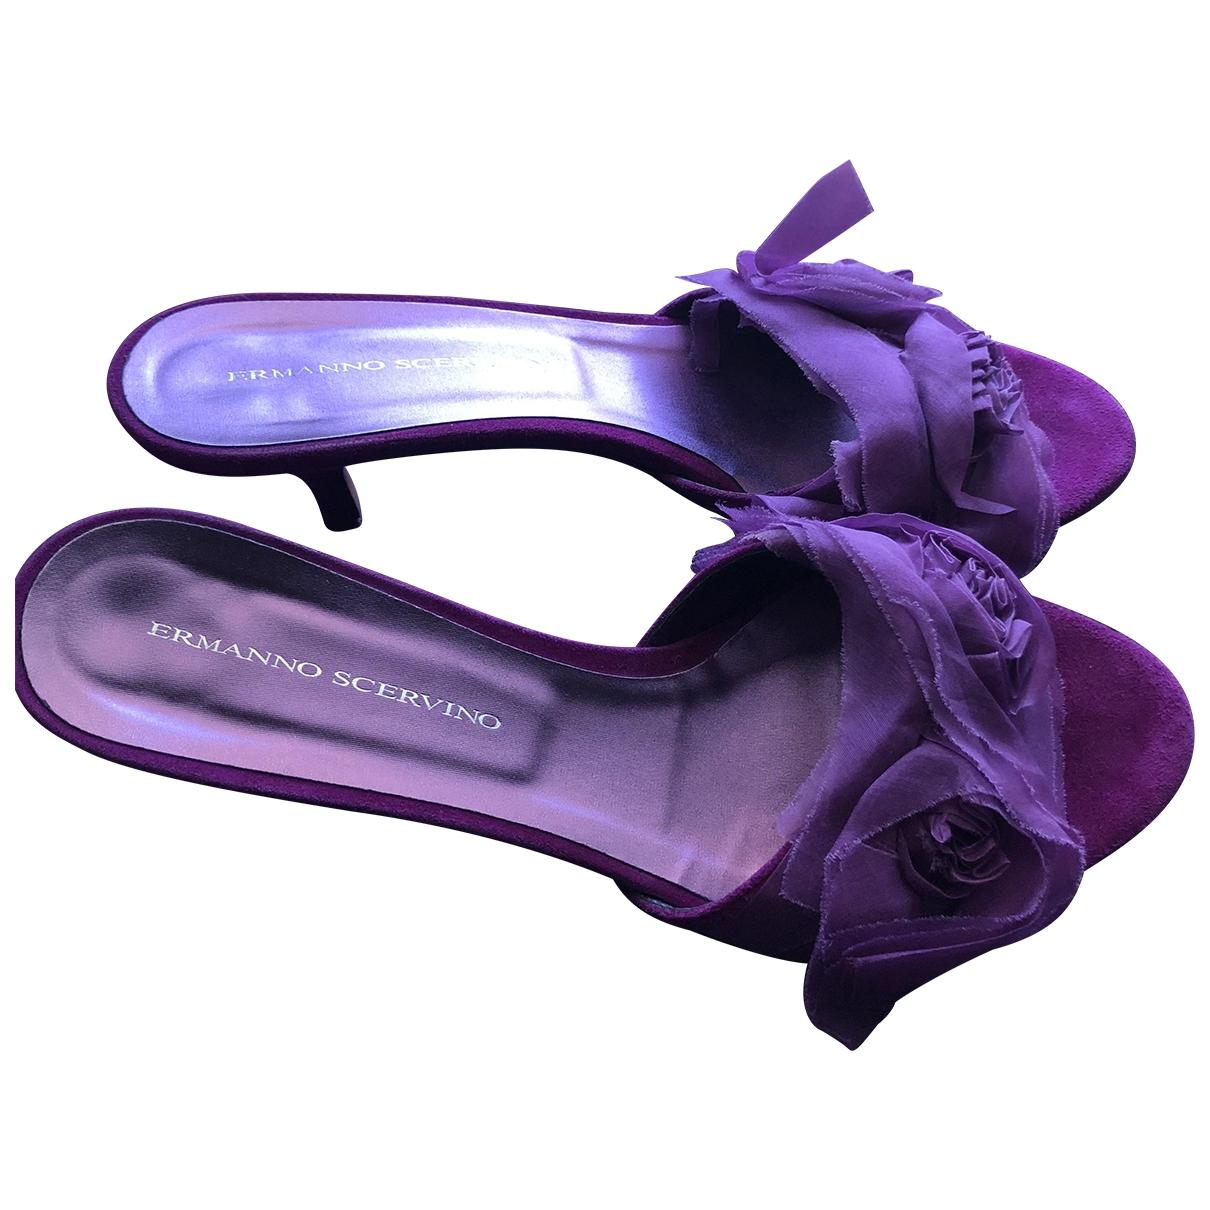 Ermanno Scervino - Sandales   pour femme en toile - violet